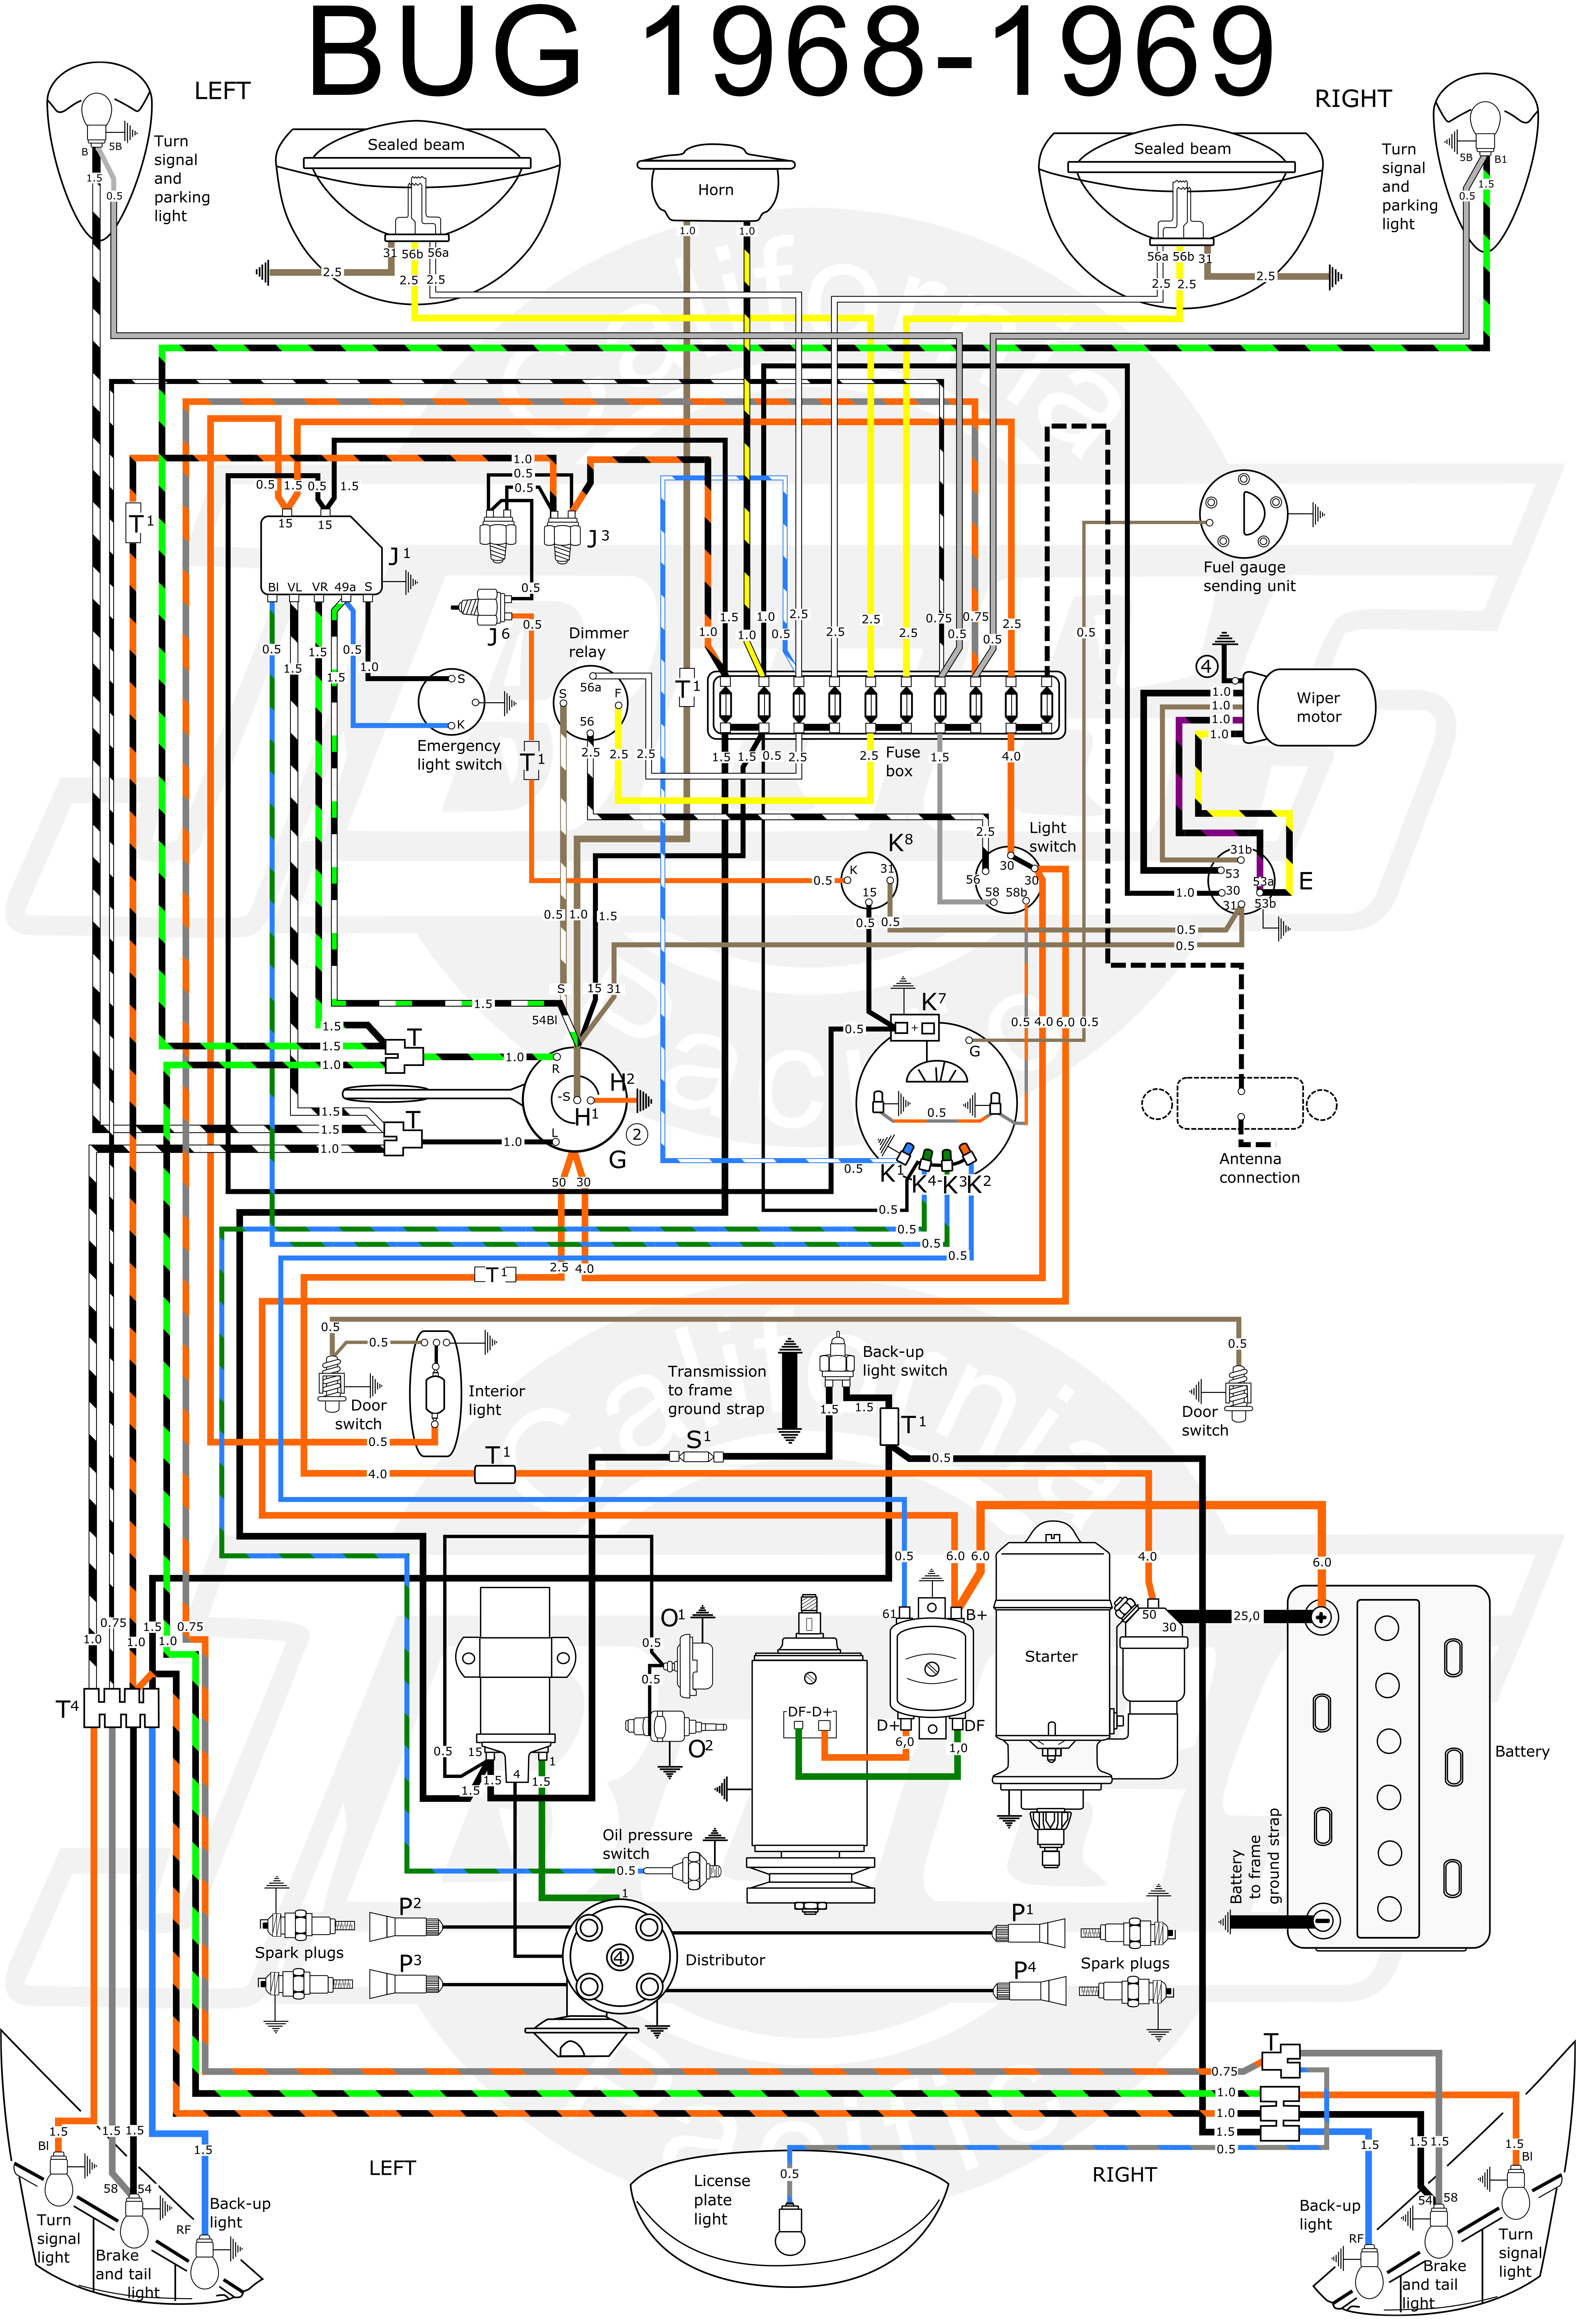 1972 Ford Maverick Wiring Harness Johnson 100 Hp Wiring Diagram Yjm308 Pujaan Hati Jeanjaures37 Fr